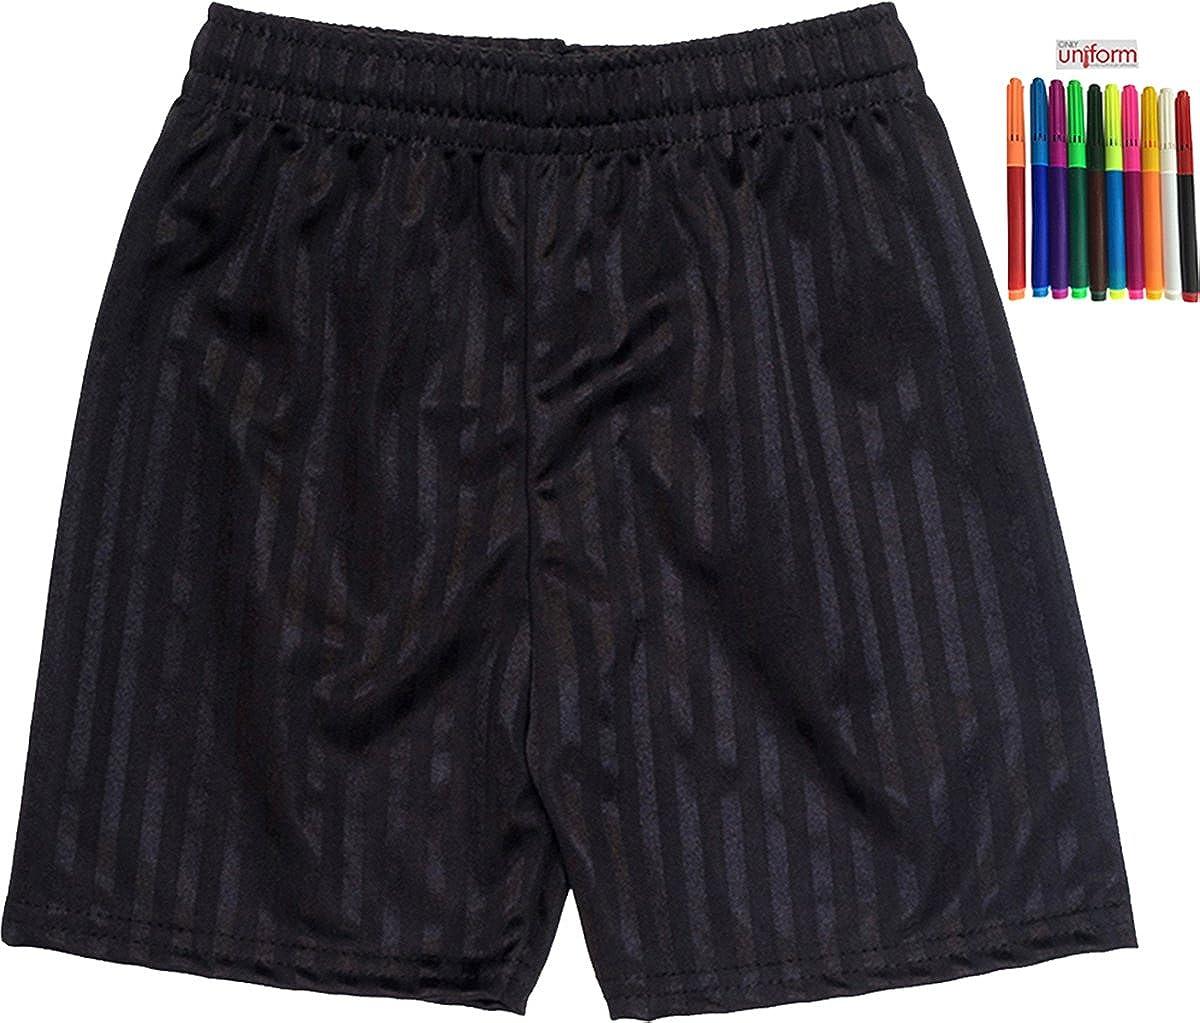 Shadow Stripe Gym Sports Games School Pe Shorts Unisex Black 13-14 Years